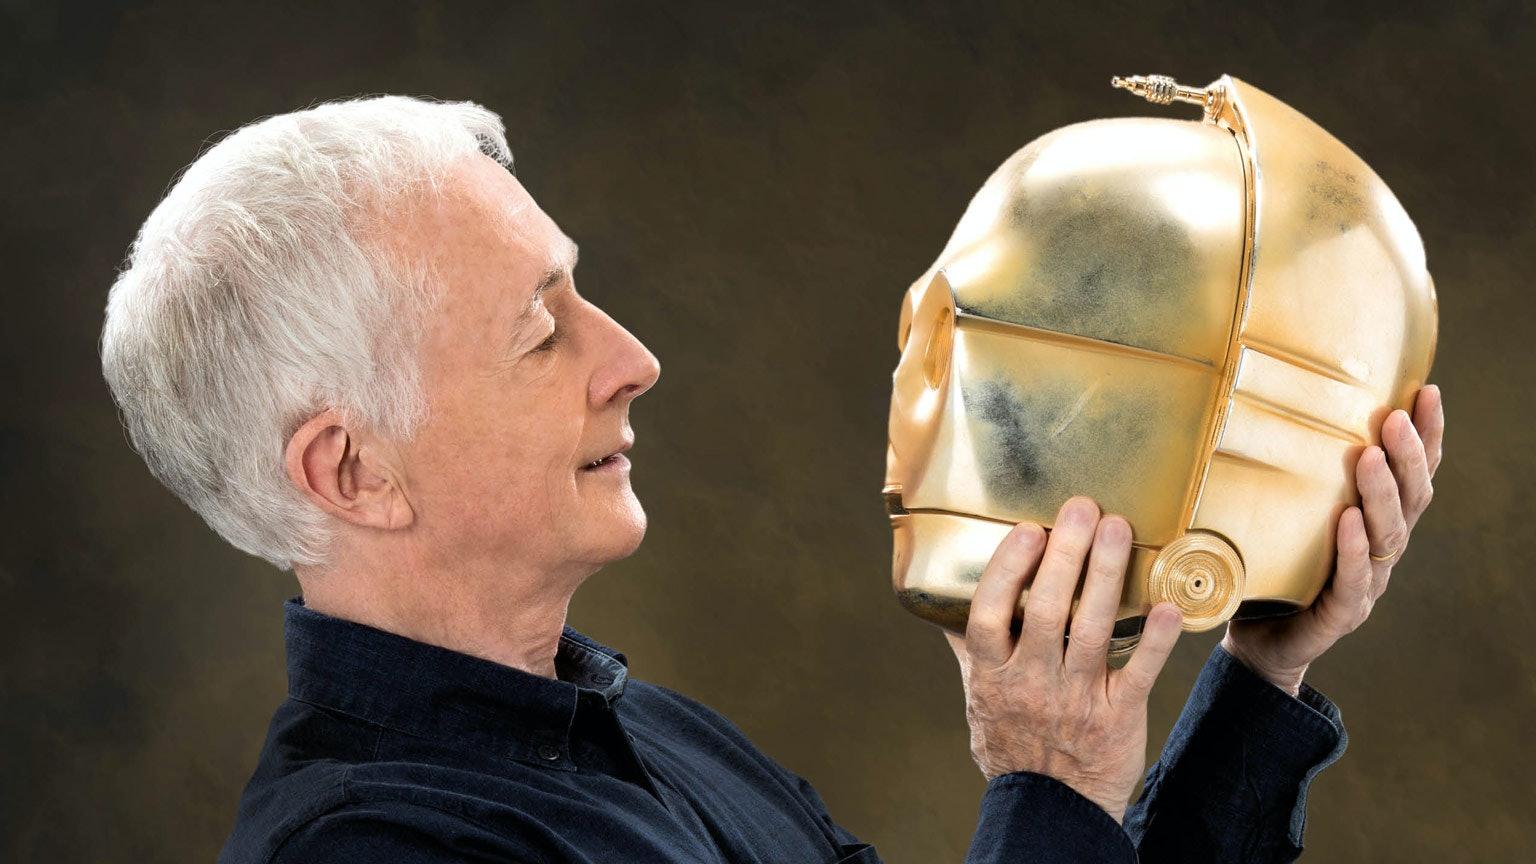 Alas poor Daniels, I knew him C-3PO. (Credit: Star Wars.com)